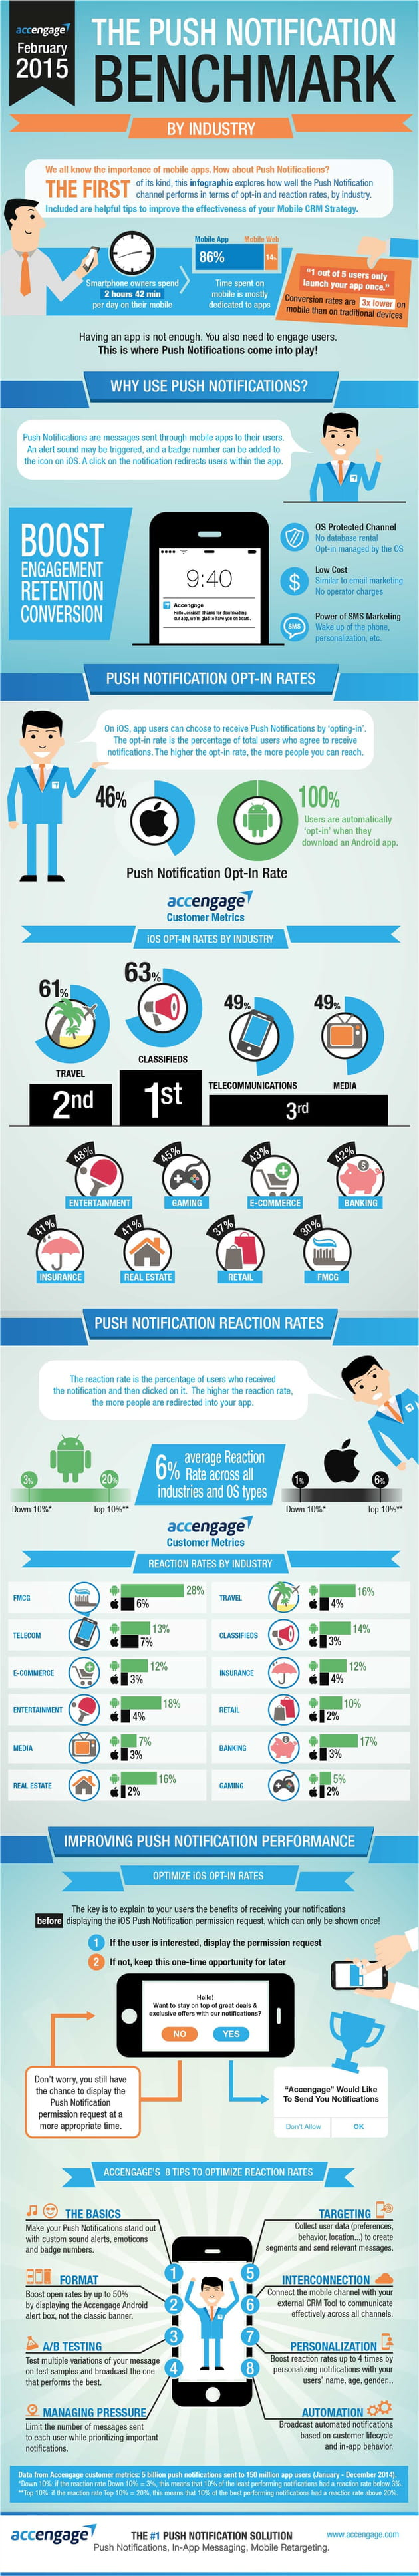 push notification benchmark